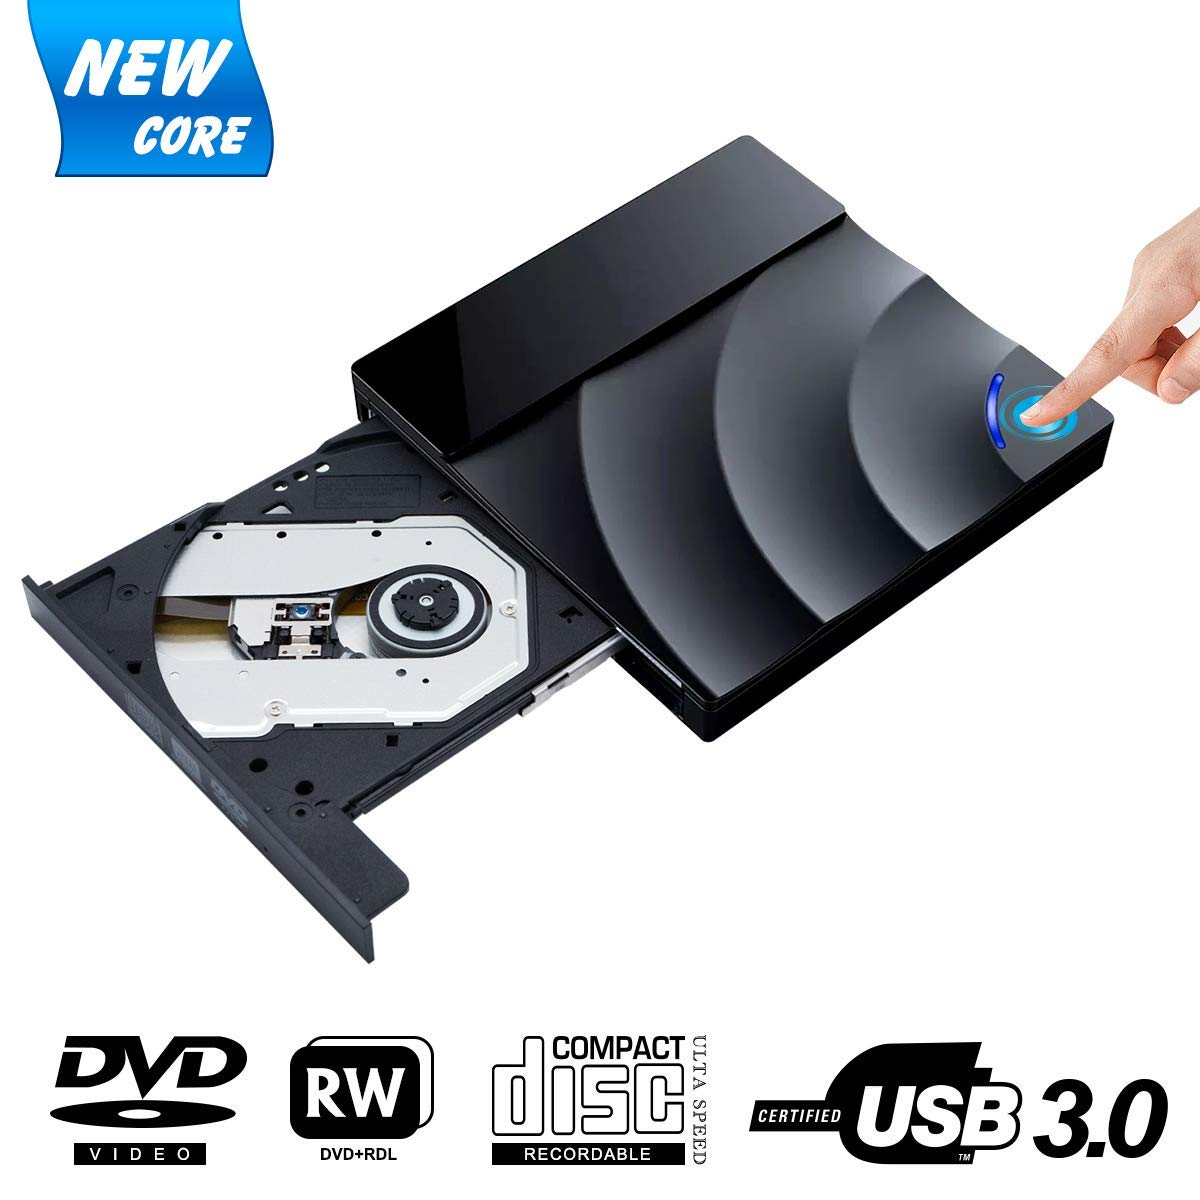 Snorain External CD/DVD Drive,USB 3.0 DVD +/-RW Superdrive CD Burner with High Speed Data Transfer Compatible for MacBook Laptop Desktop PC Windows10 /8/7 /XP Linux Mac OS (Black)